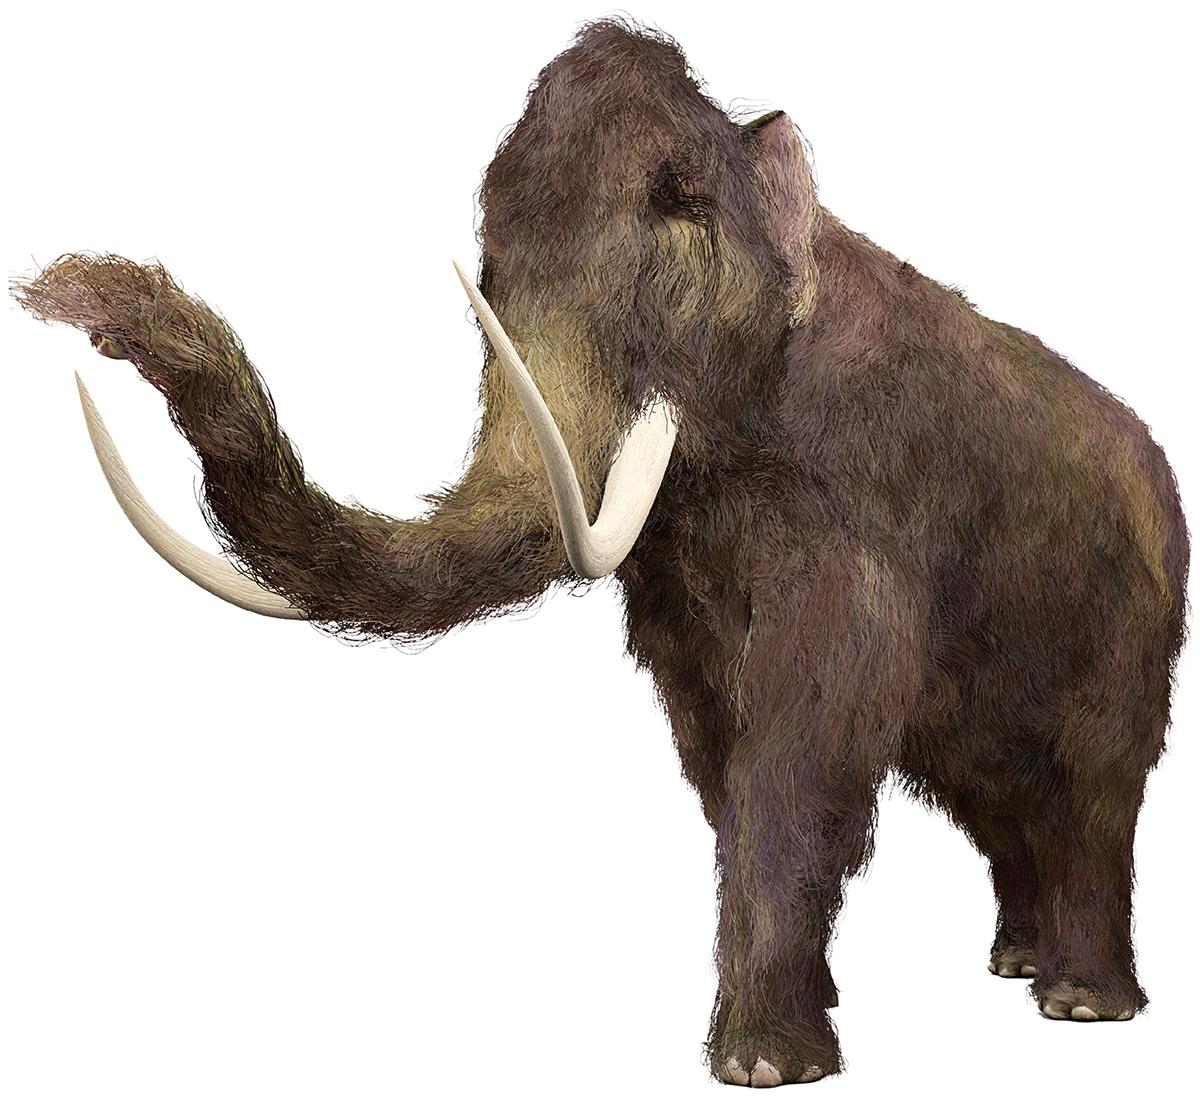 CRISPR-Cas9 woolly mammoth